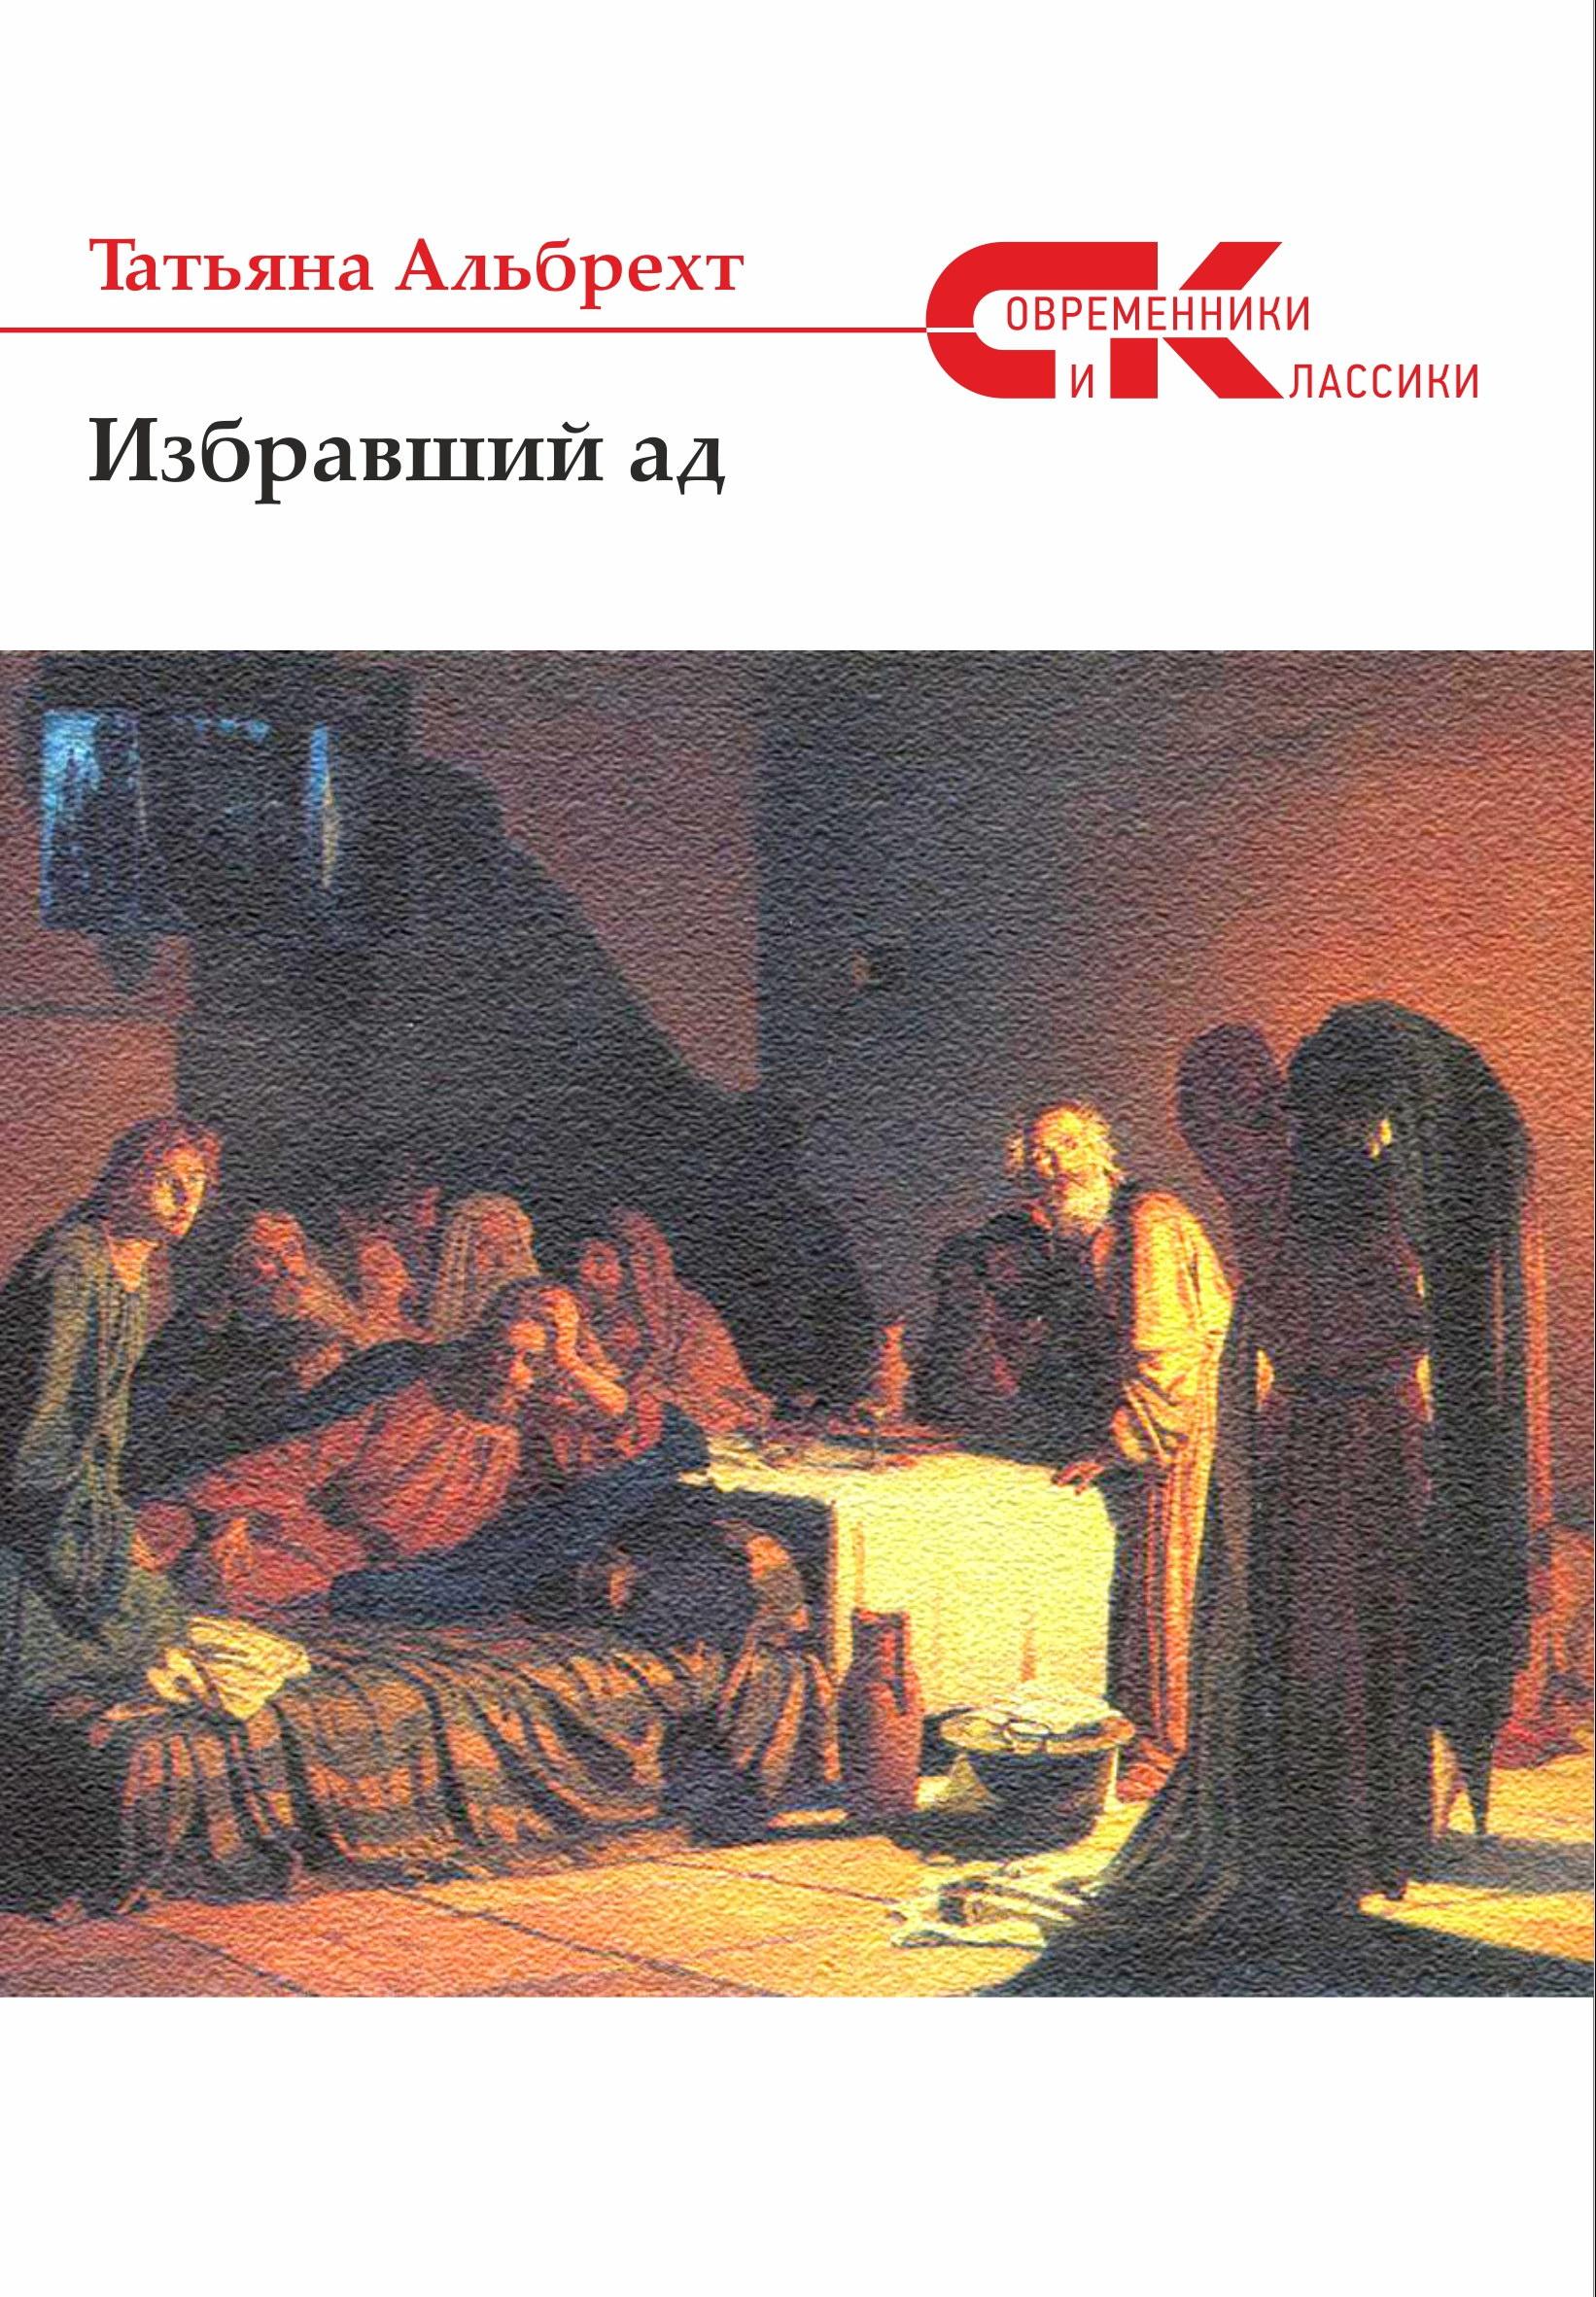 cover Izbravshyy ad Albreht